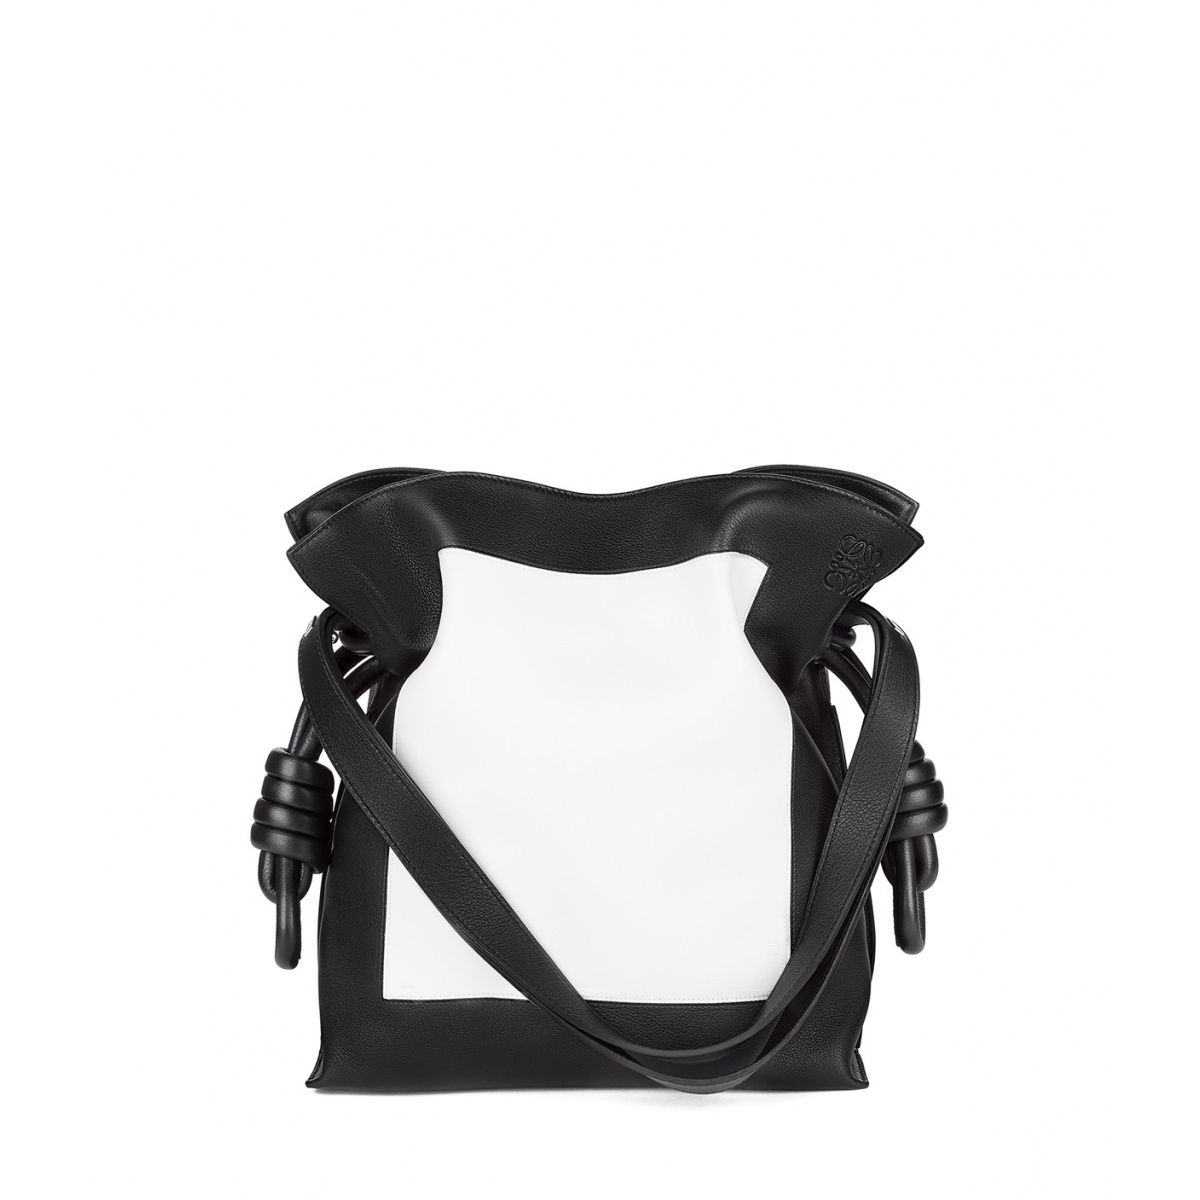 Loewe Bags - FLAMENCO KNOT BAG Black/white Discover Loewe Bags products, like our FLAMENCO KNOT BAG black/white. Enter now.